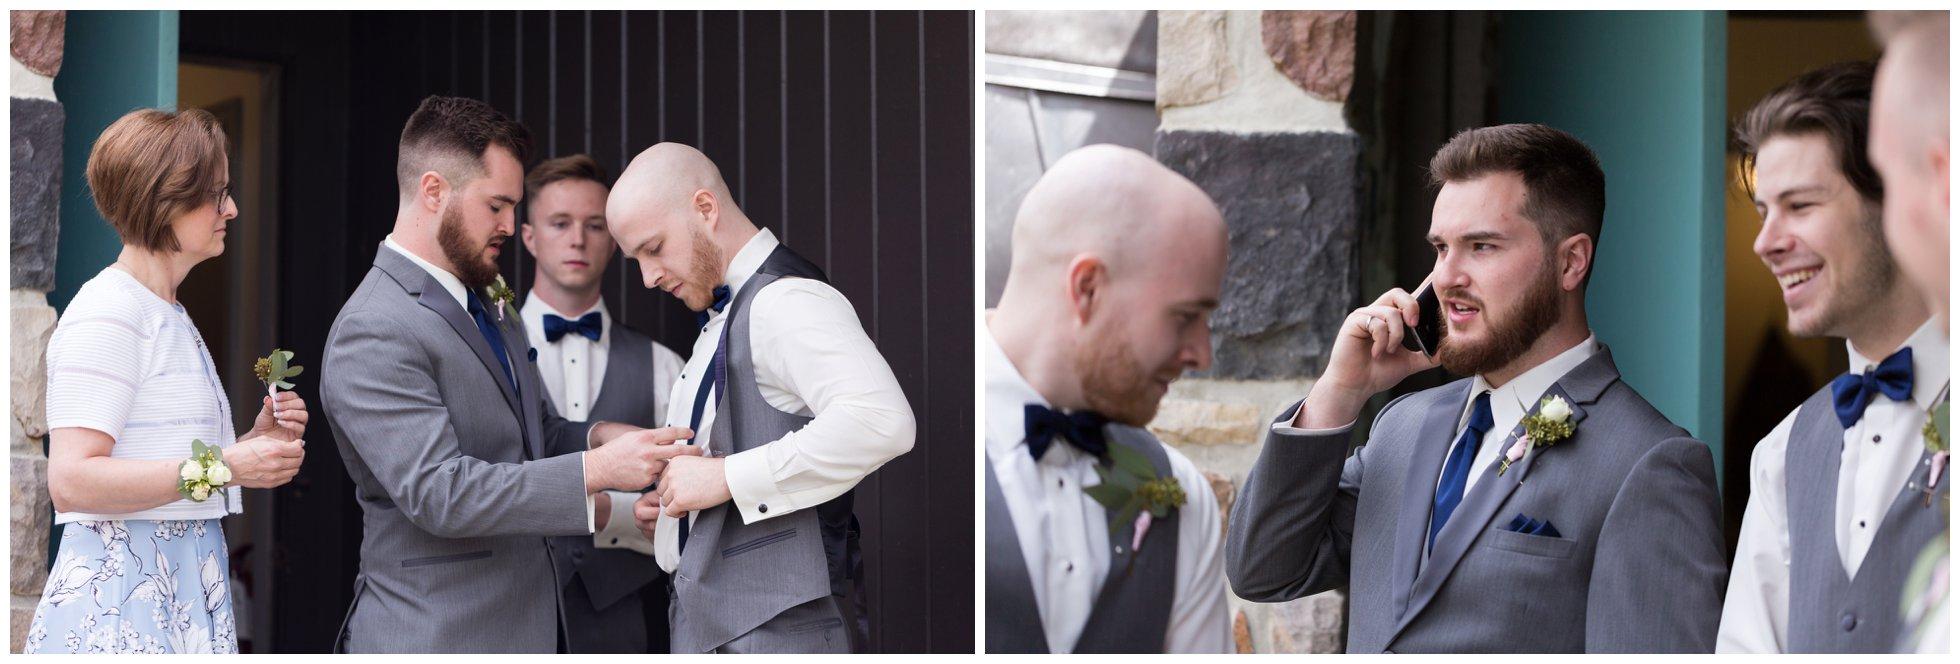 Emily and Royden Edmonton Wedding (Life by Selena Photography)_0001.jpg